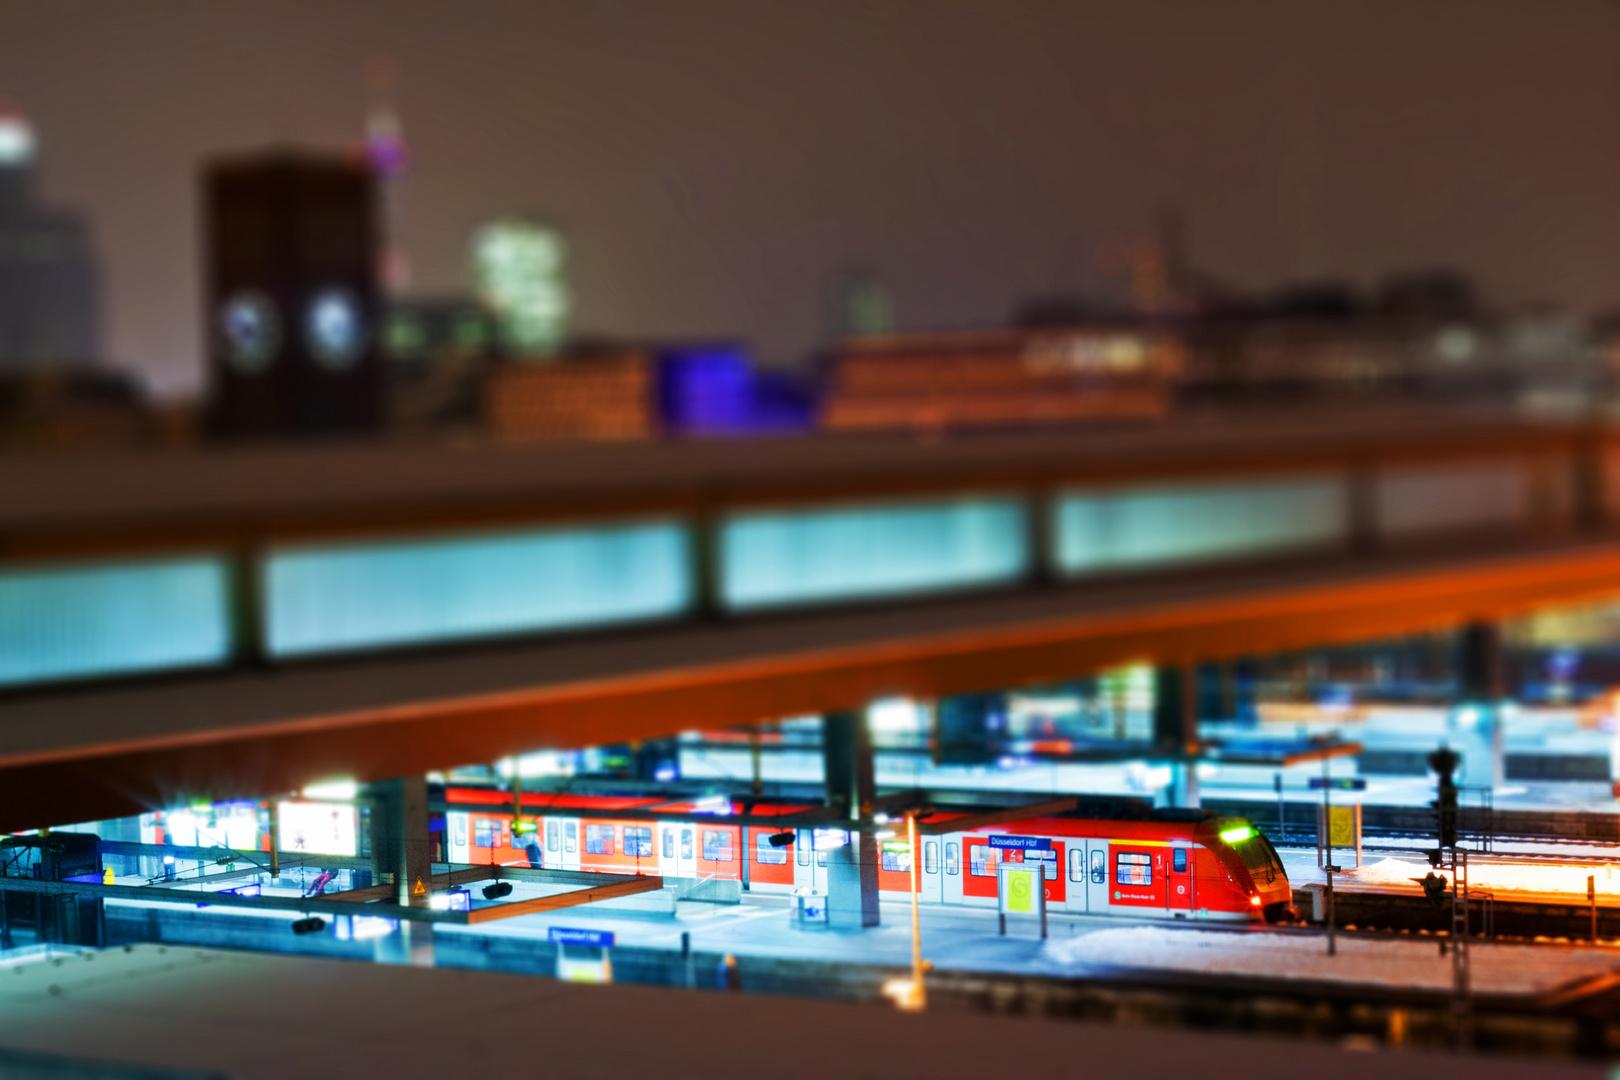 Düsseldorf Hbf bei Nacht mit Miniatur-Effekt (Tilt/Shift)